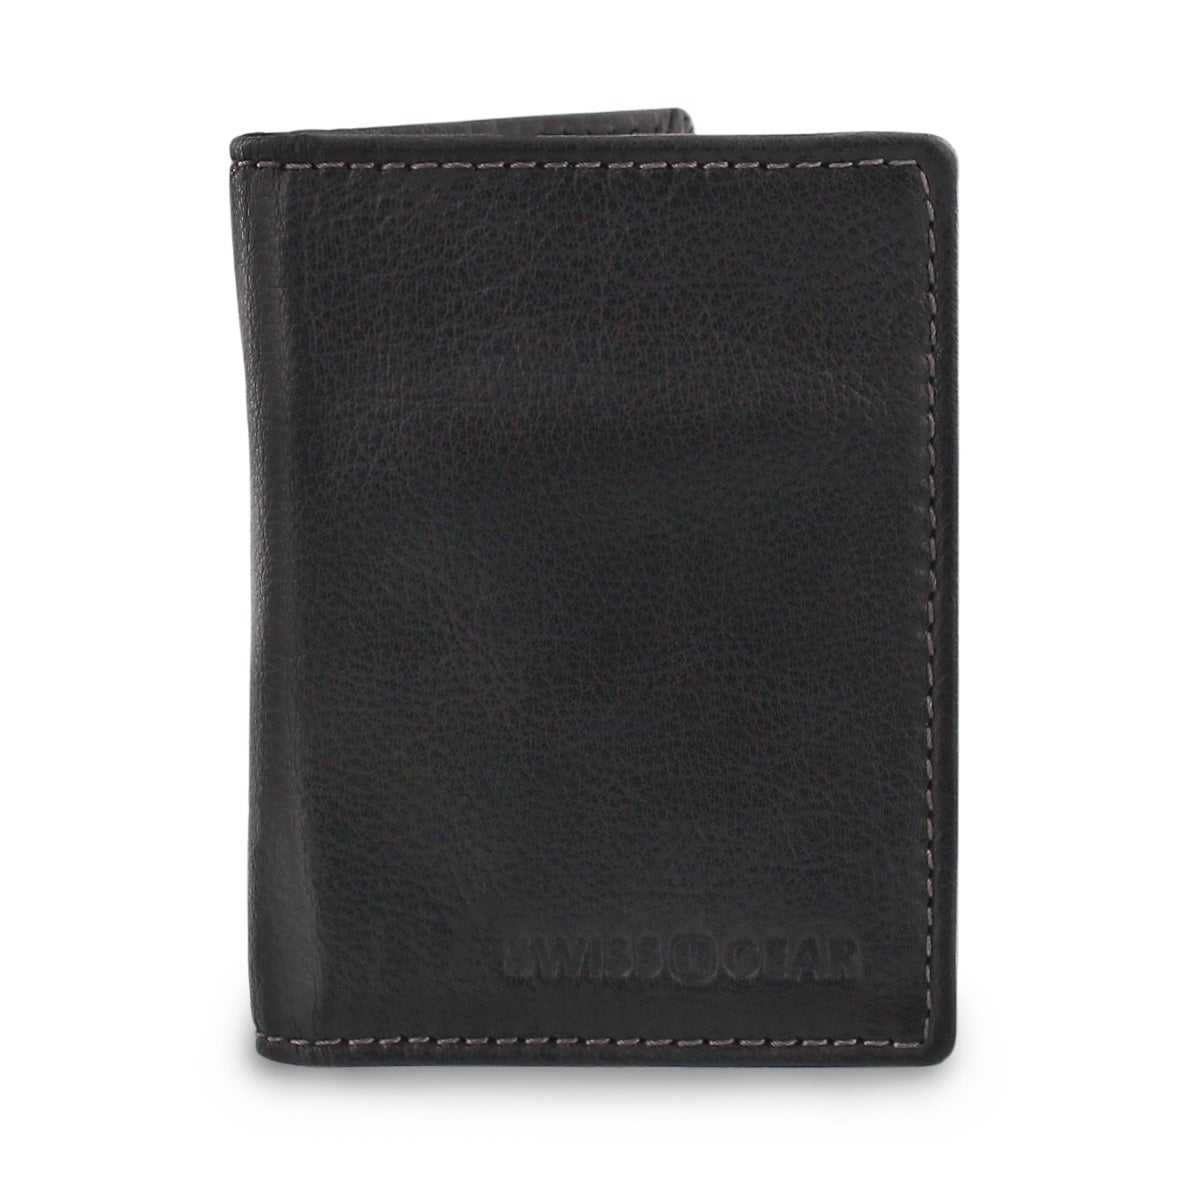 Mns black slim card case wallet